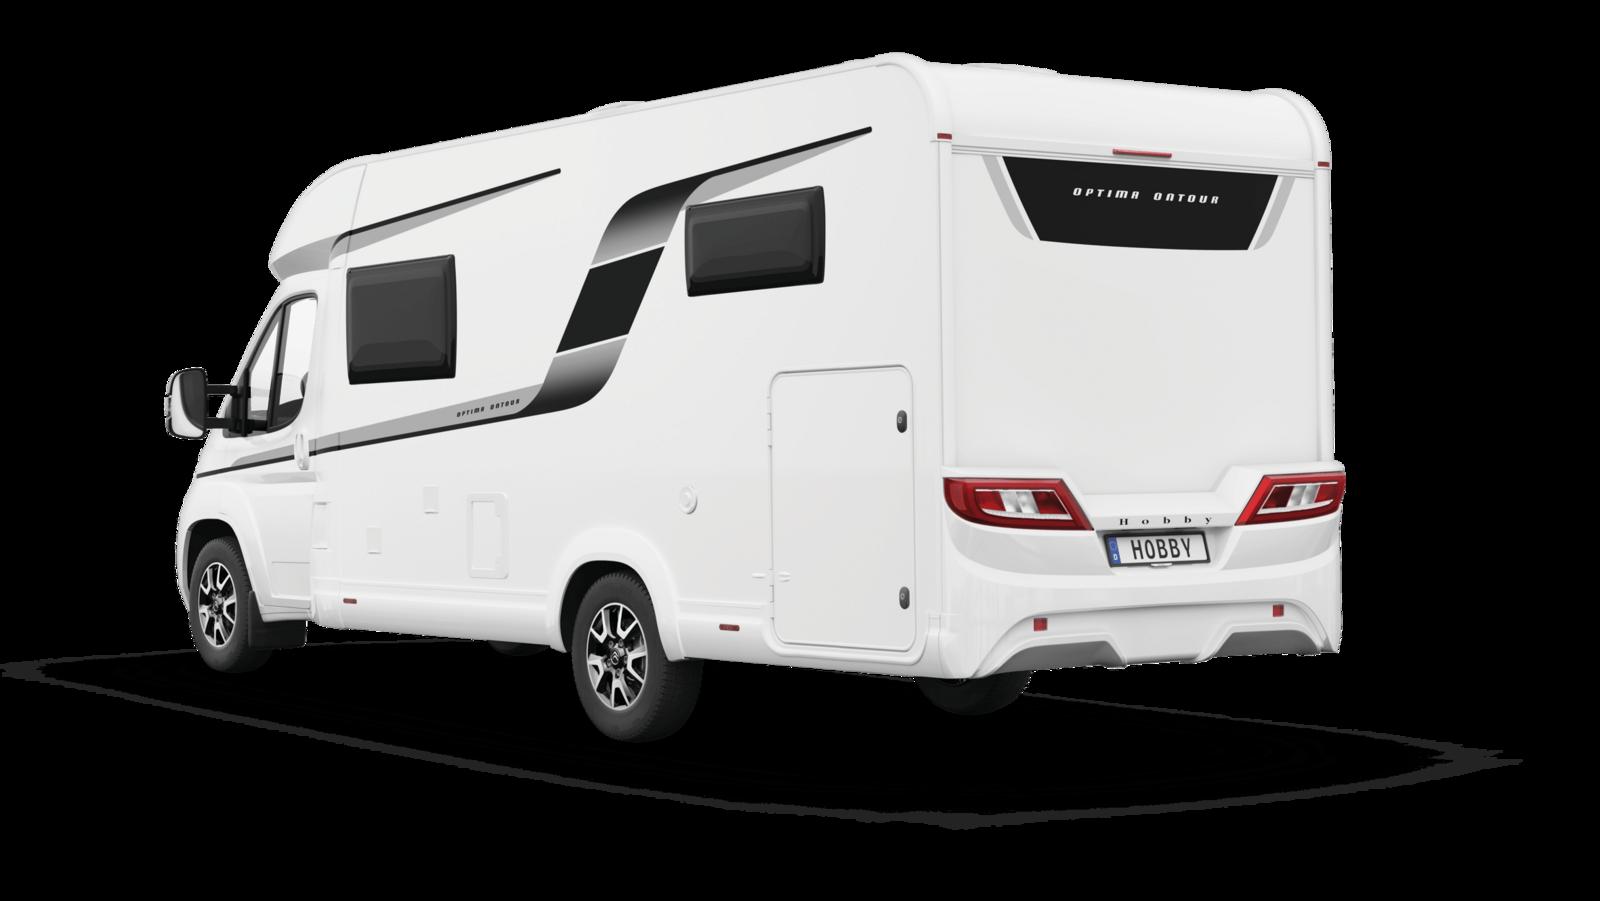 2022-RM-Freisteller-Heck-Optima-Ontour-T65GE-PRESSE-lowres